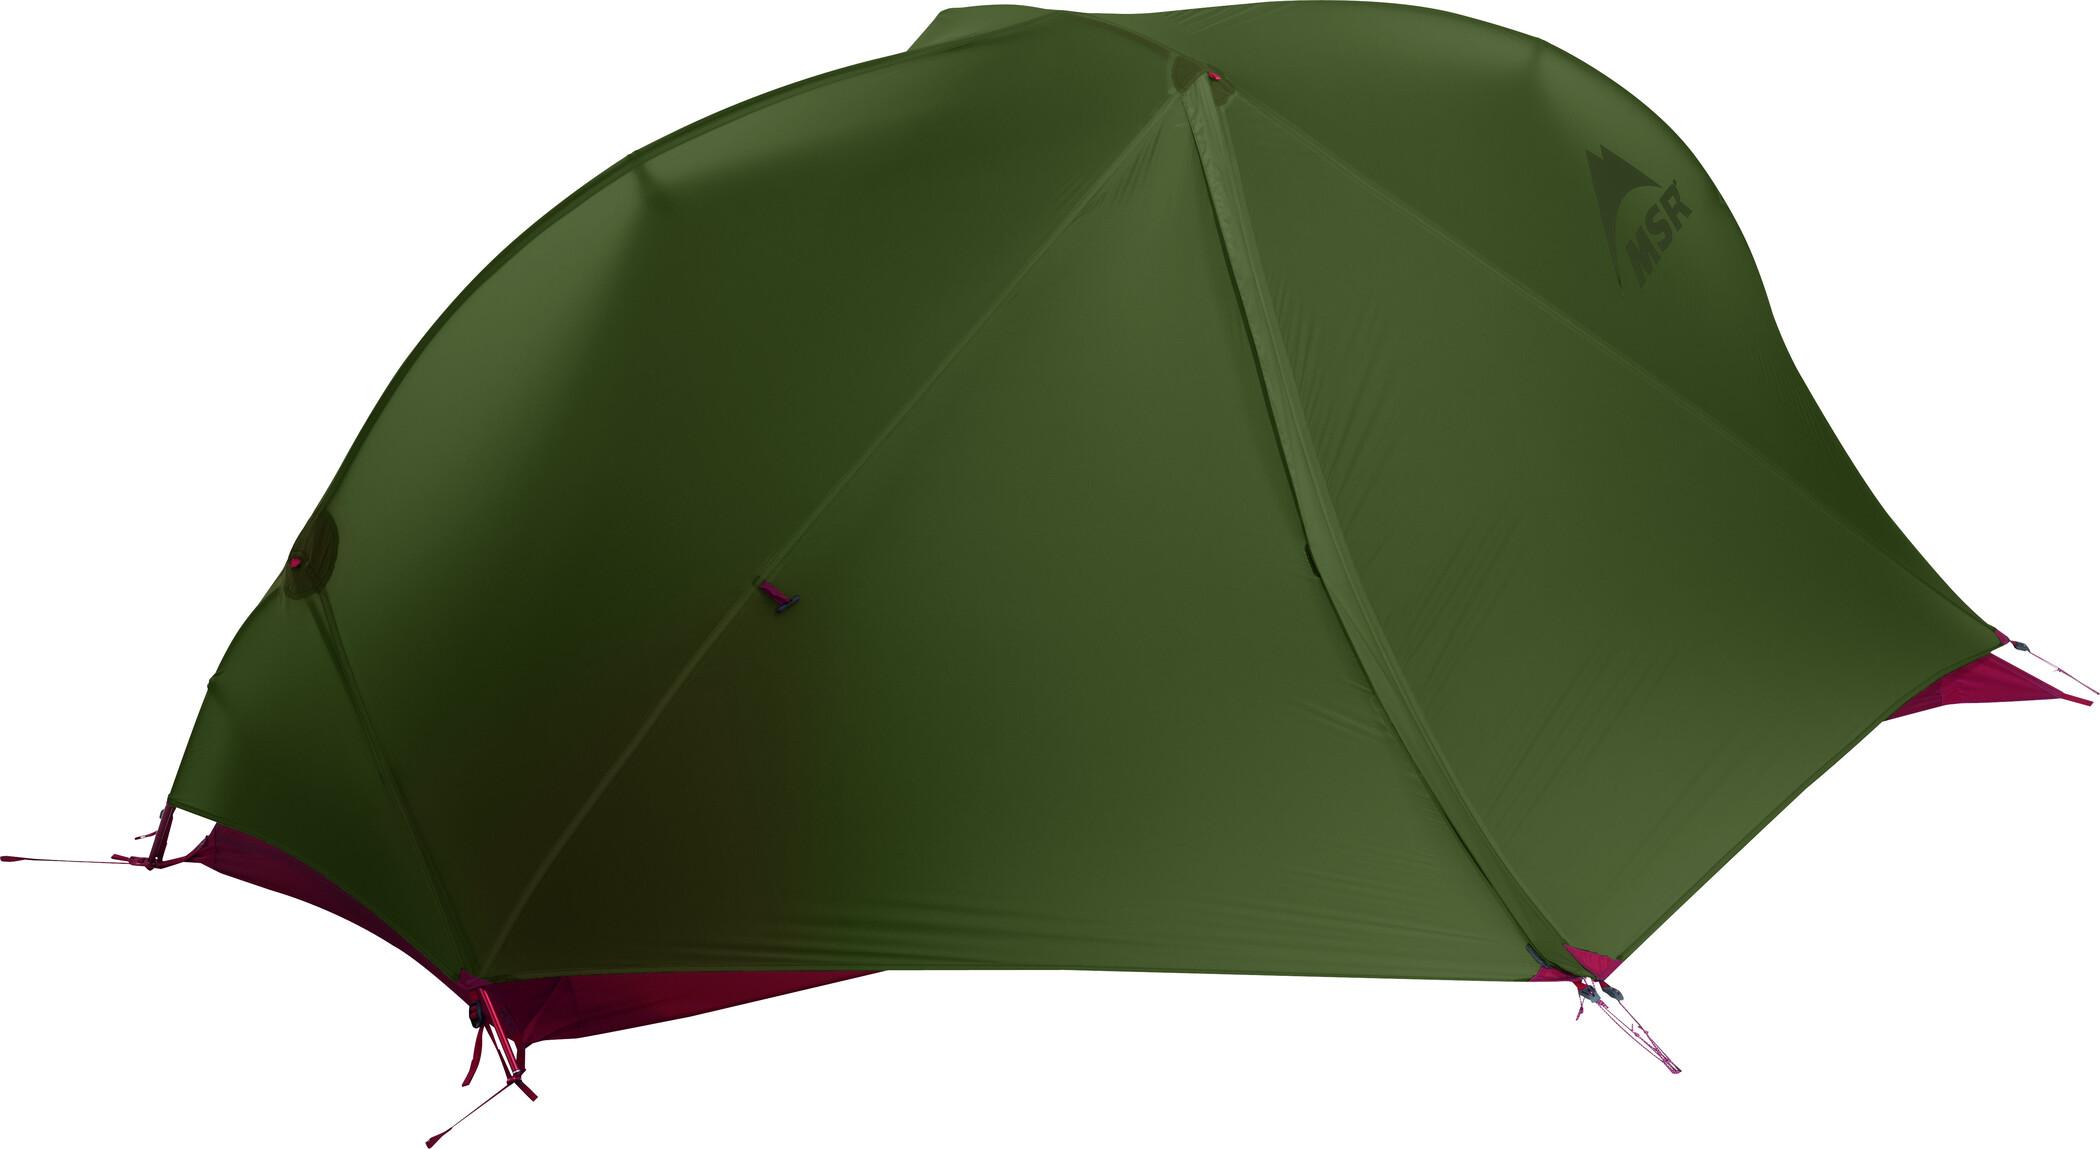 MSR FreeLite 1 Green V2 Telt, green | Transport og opbevaring > Tilbehør